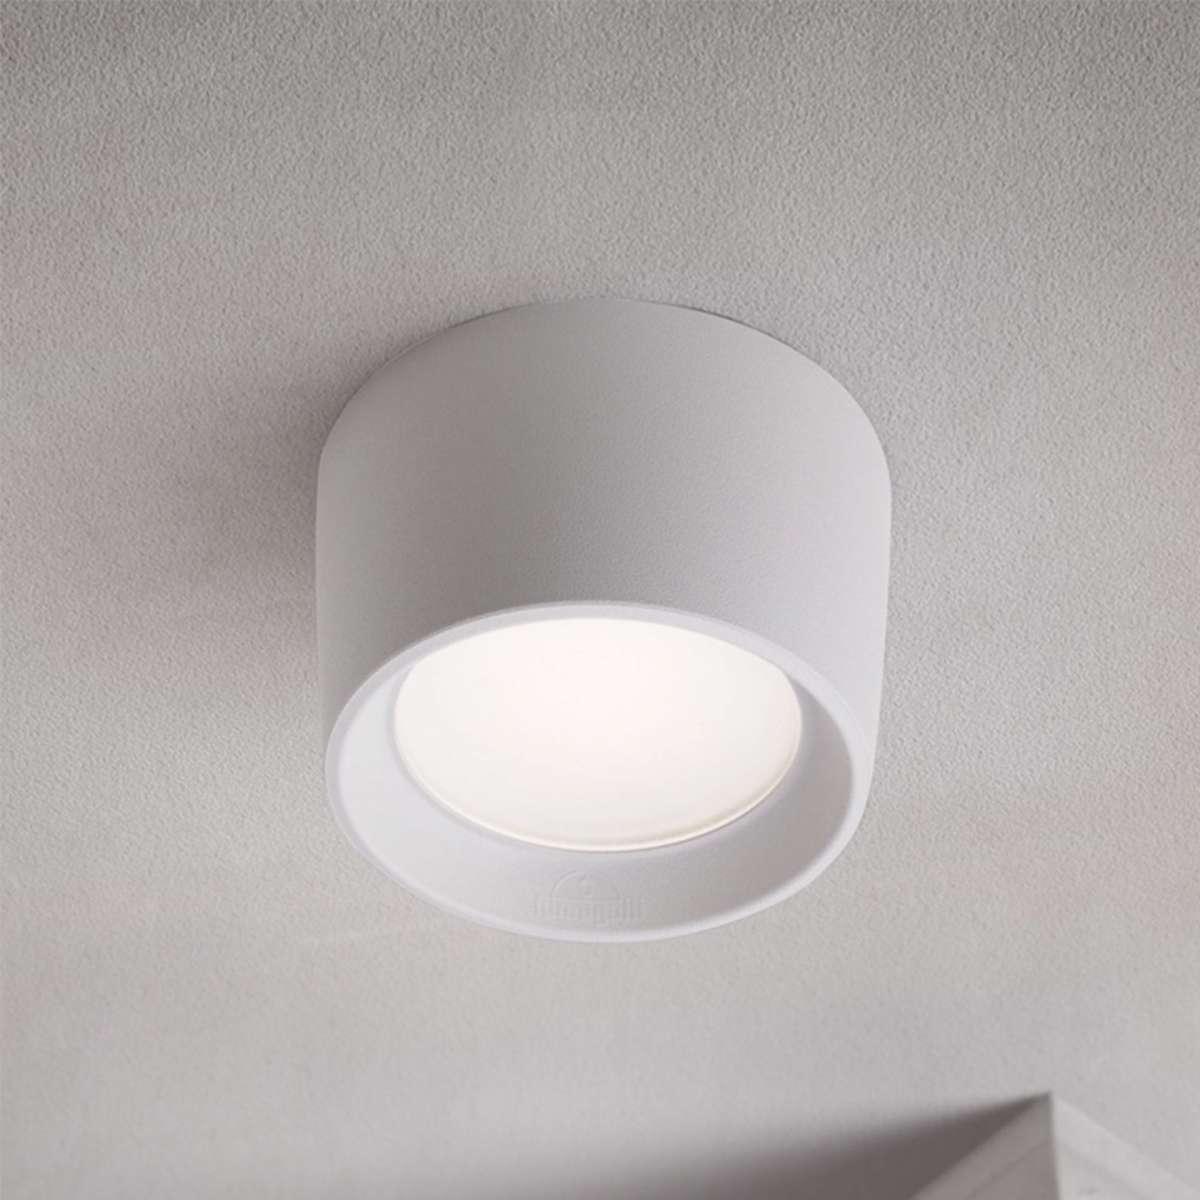 Fumagalli LIVIA160WH Livia 160 White LED 7W 4000K Ceiling Down Light